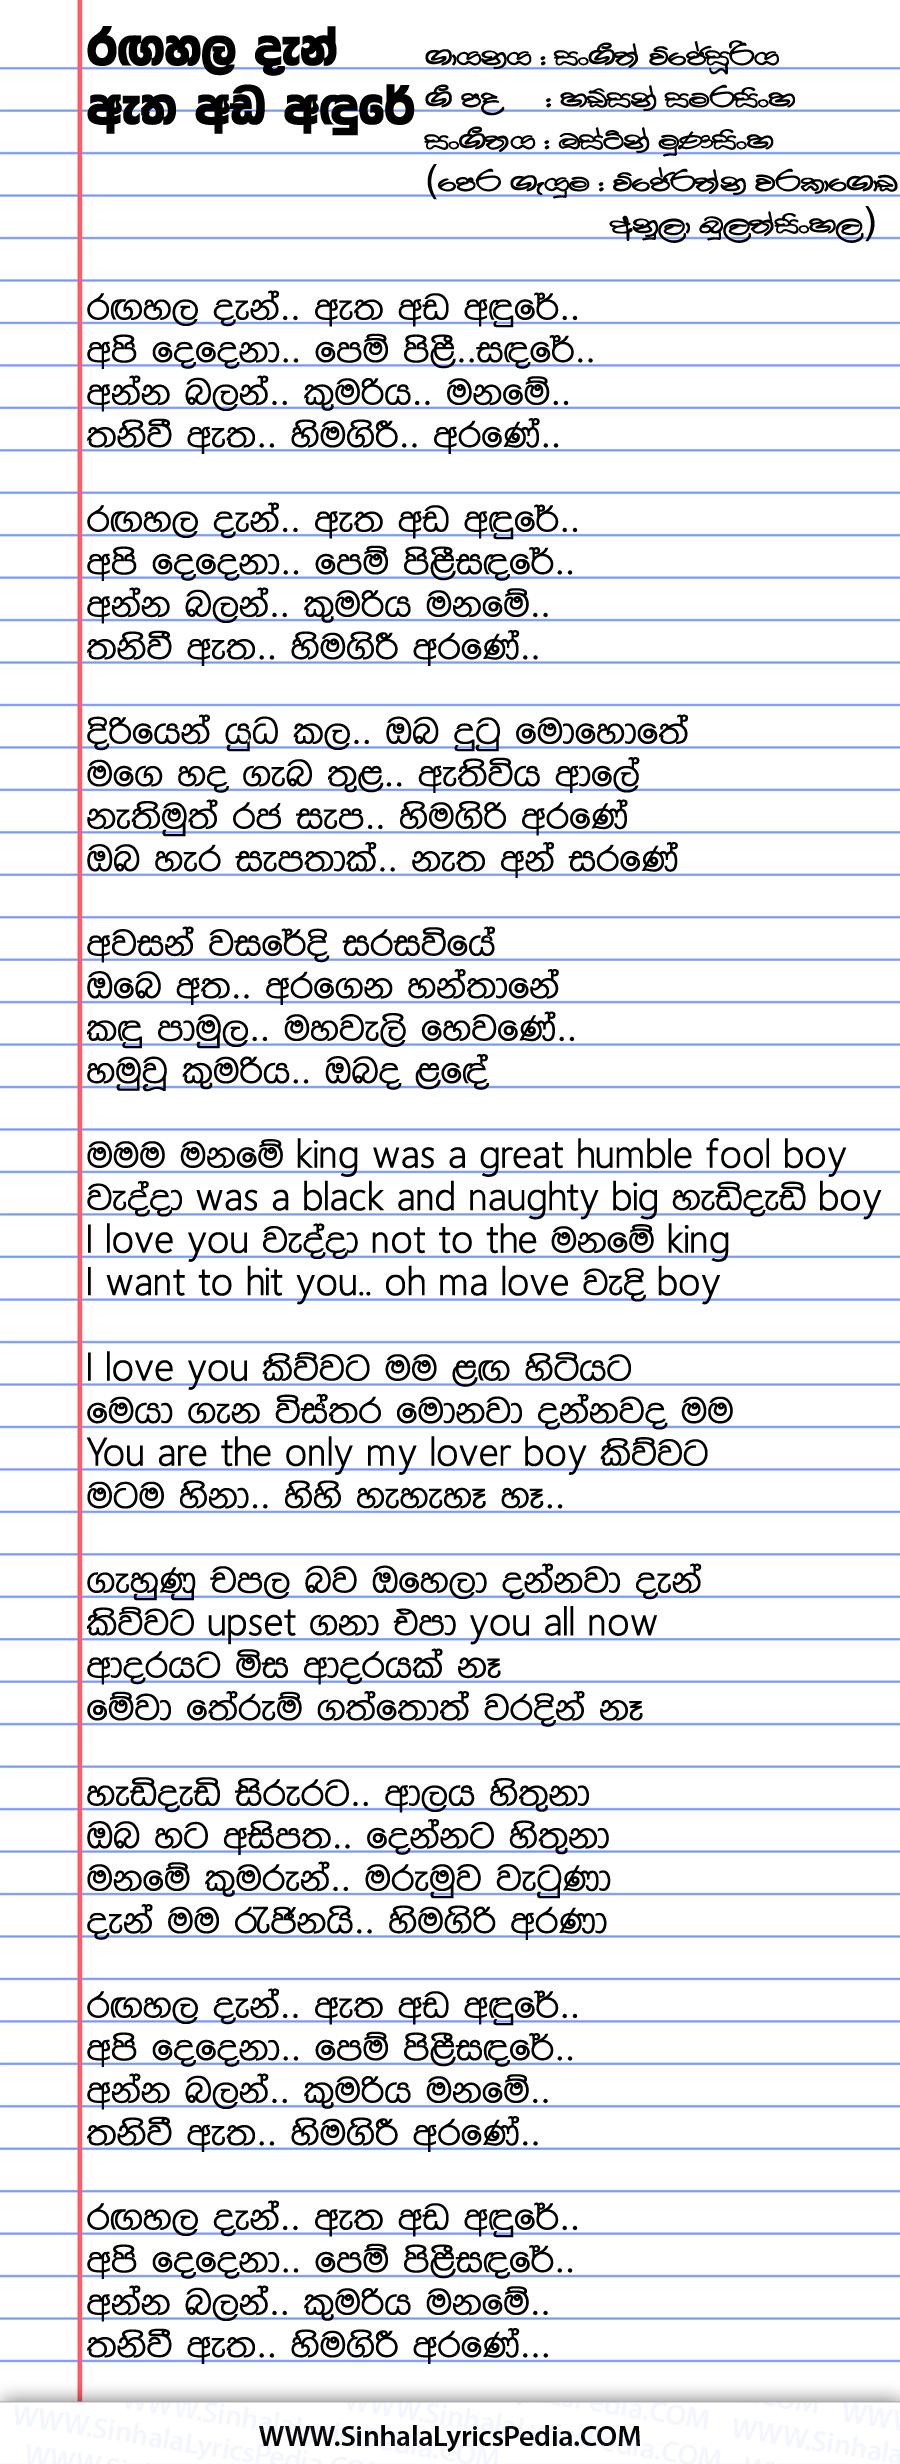 Rangahala Den Atha Ada Andure Song Lyrics